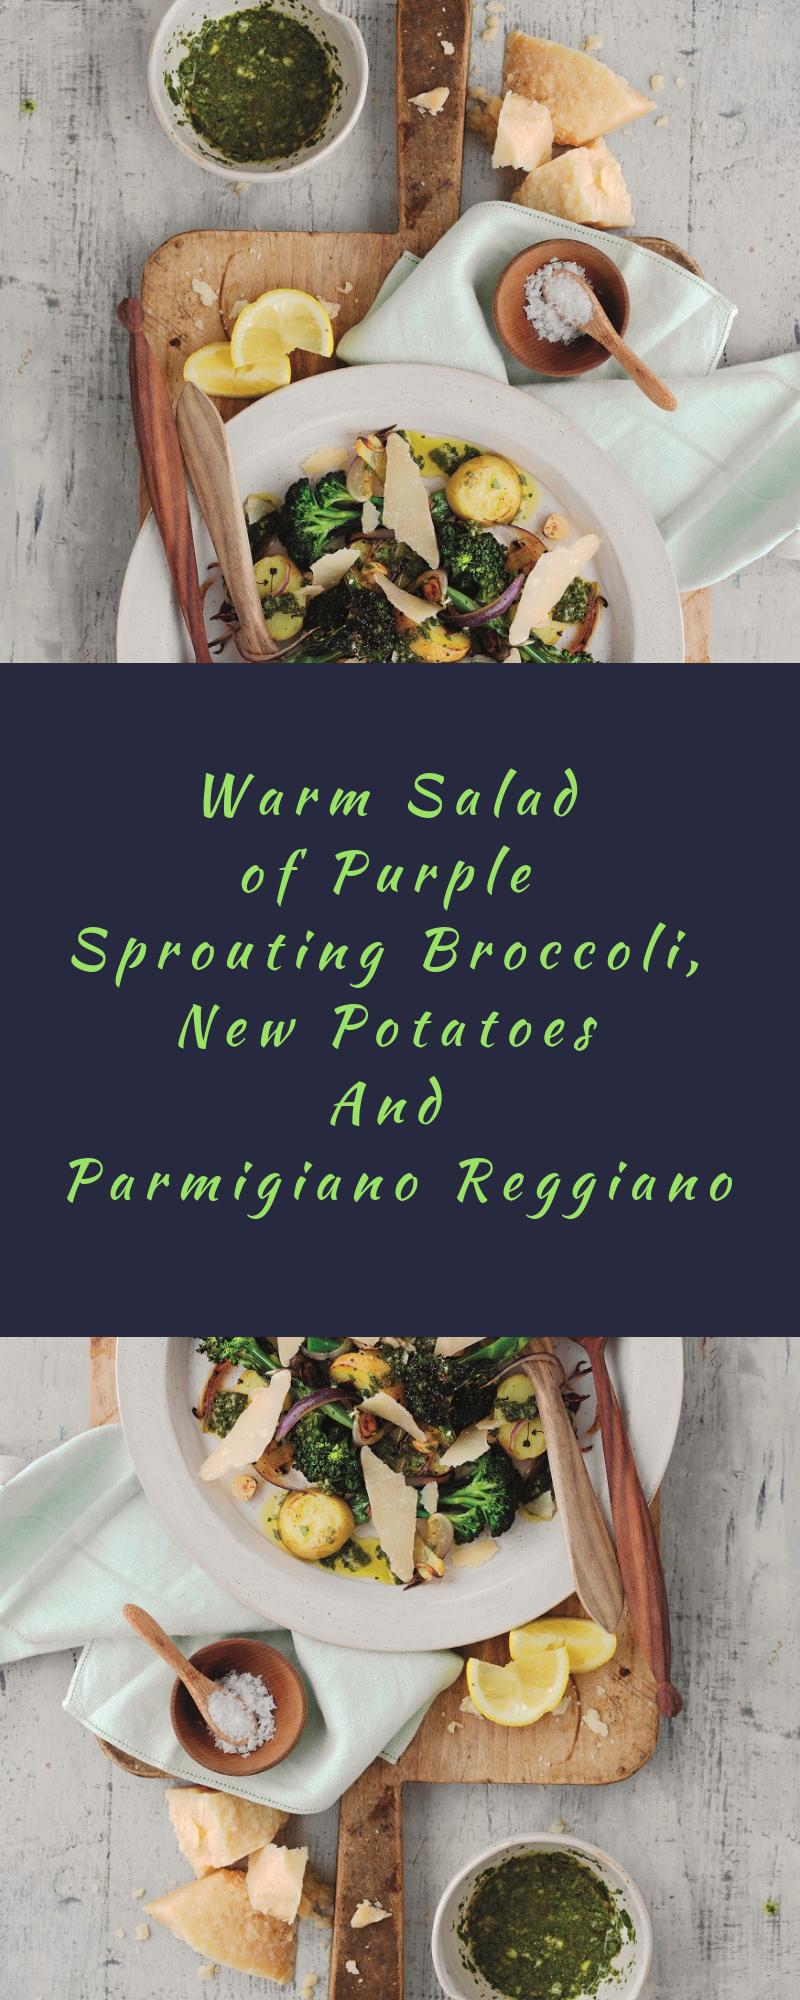 Warm Salad of Purple Sprouting Broccoli, New Potatoes And Parmigiano Reggiano